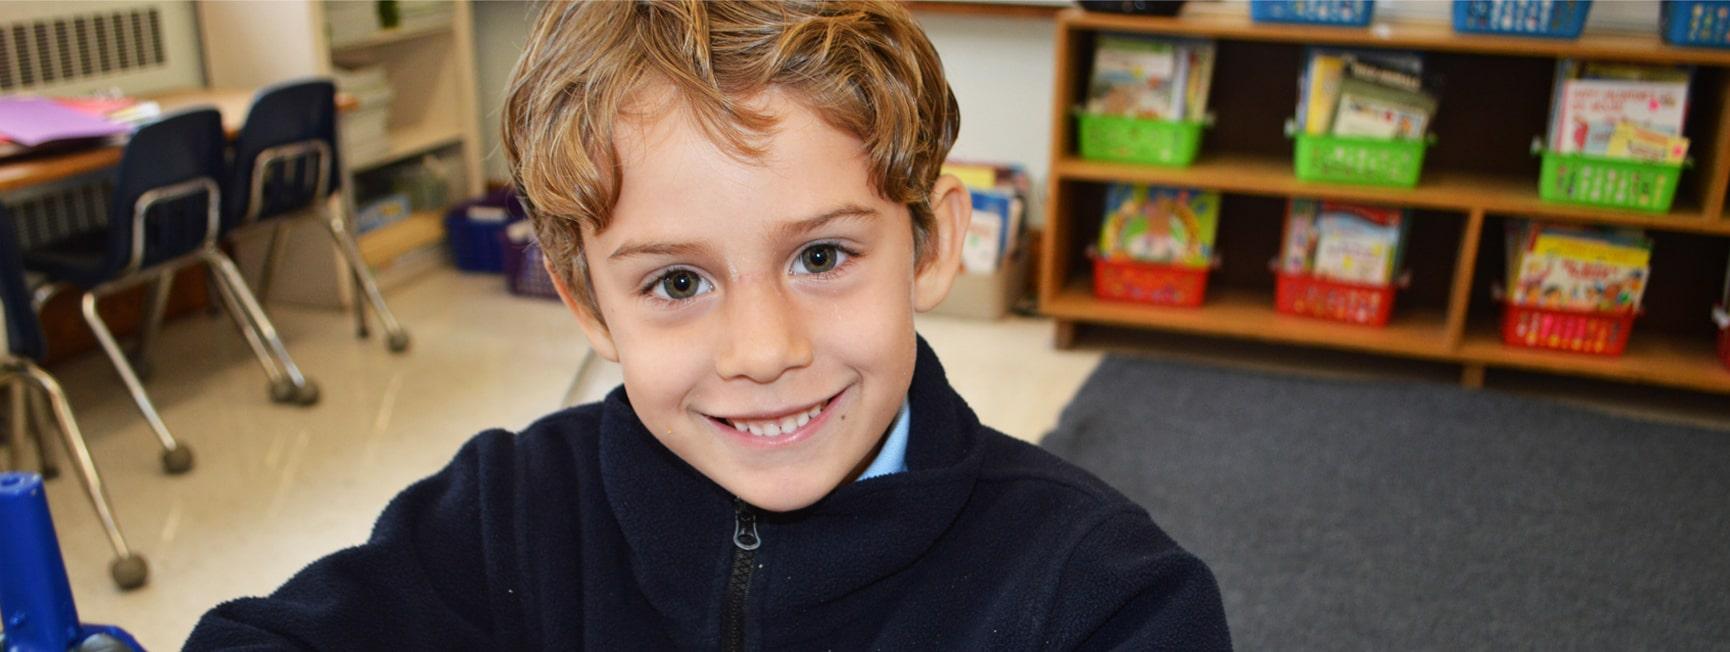 Catholic school student smiling at camera